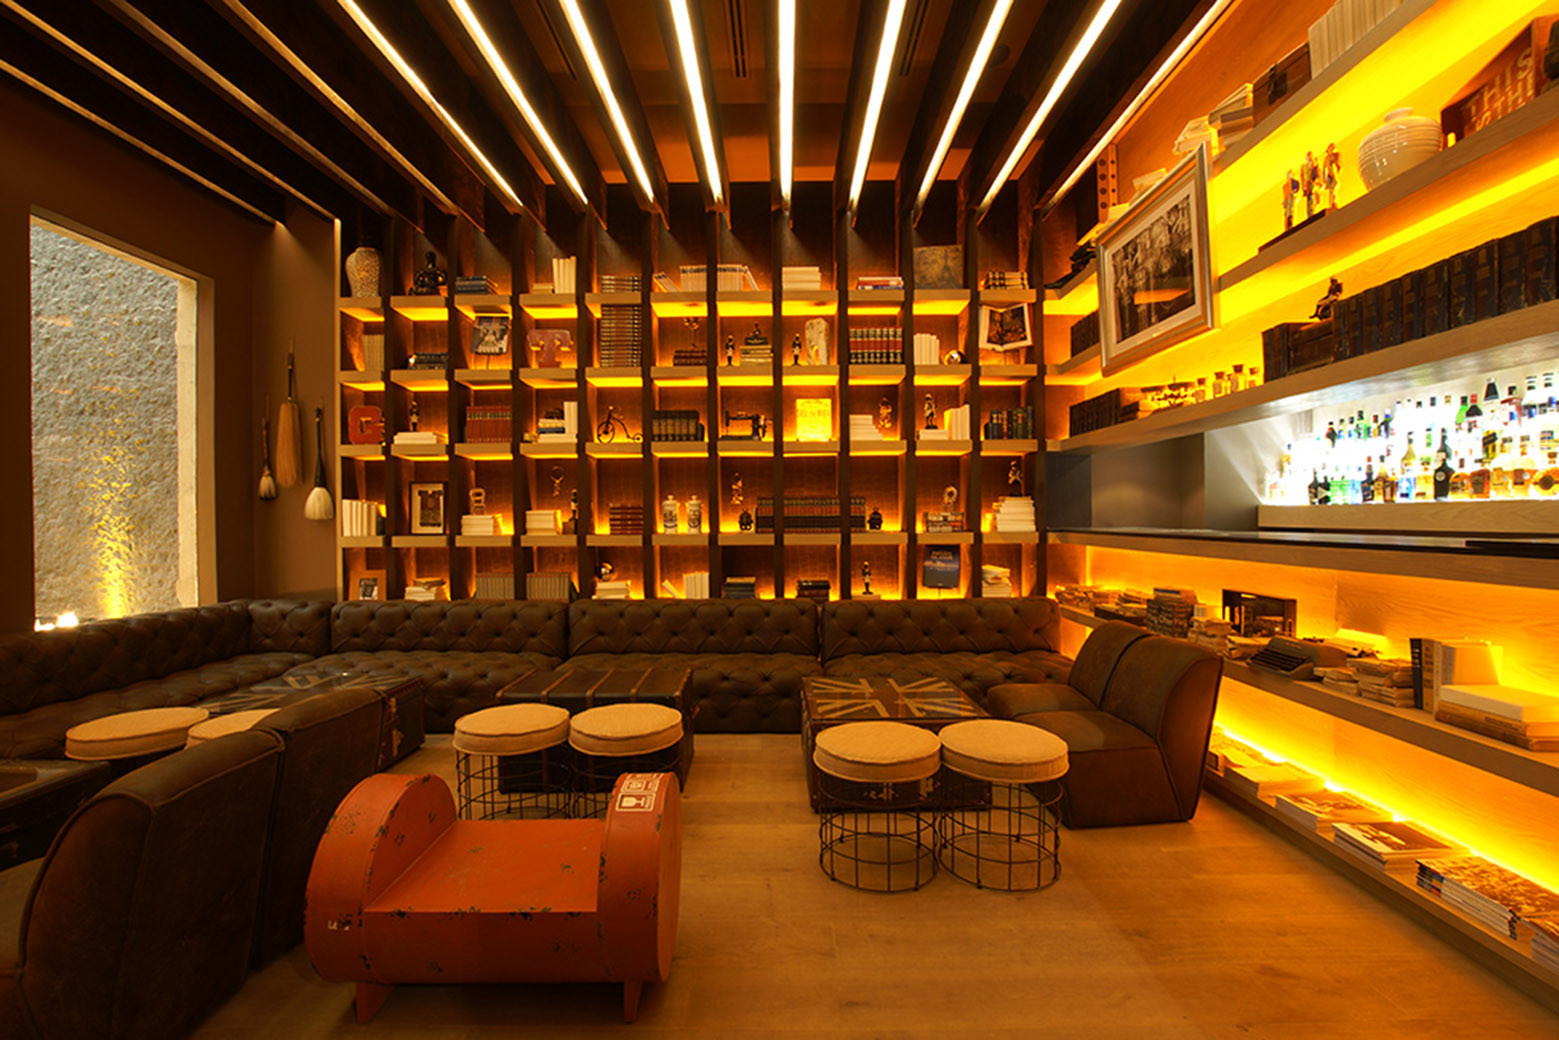 Restaurante nueve nueve sordo madaleno arquitectos for Restaurante arquitectura